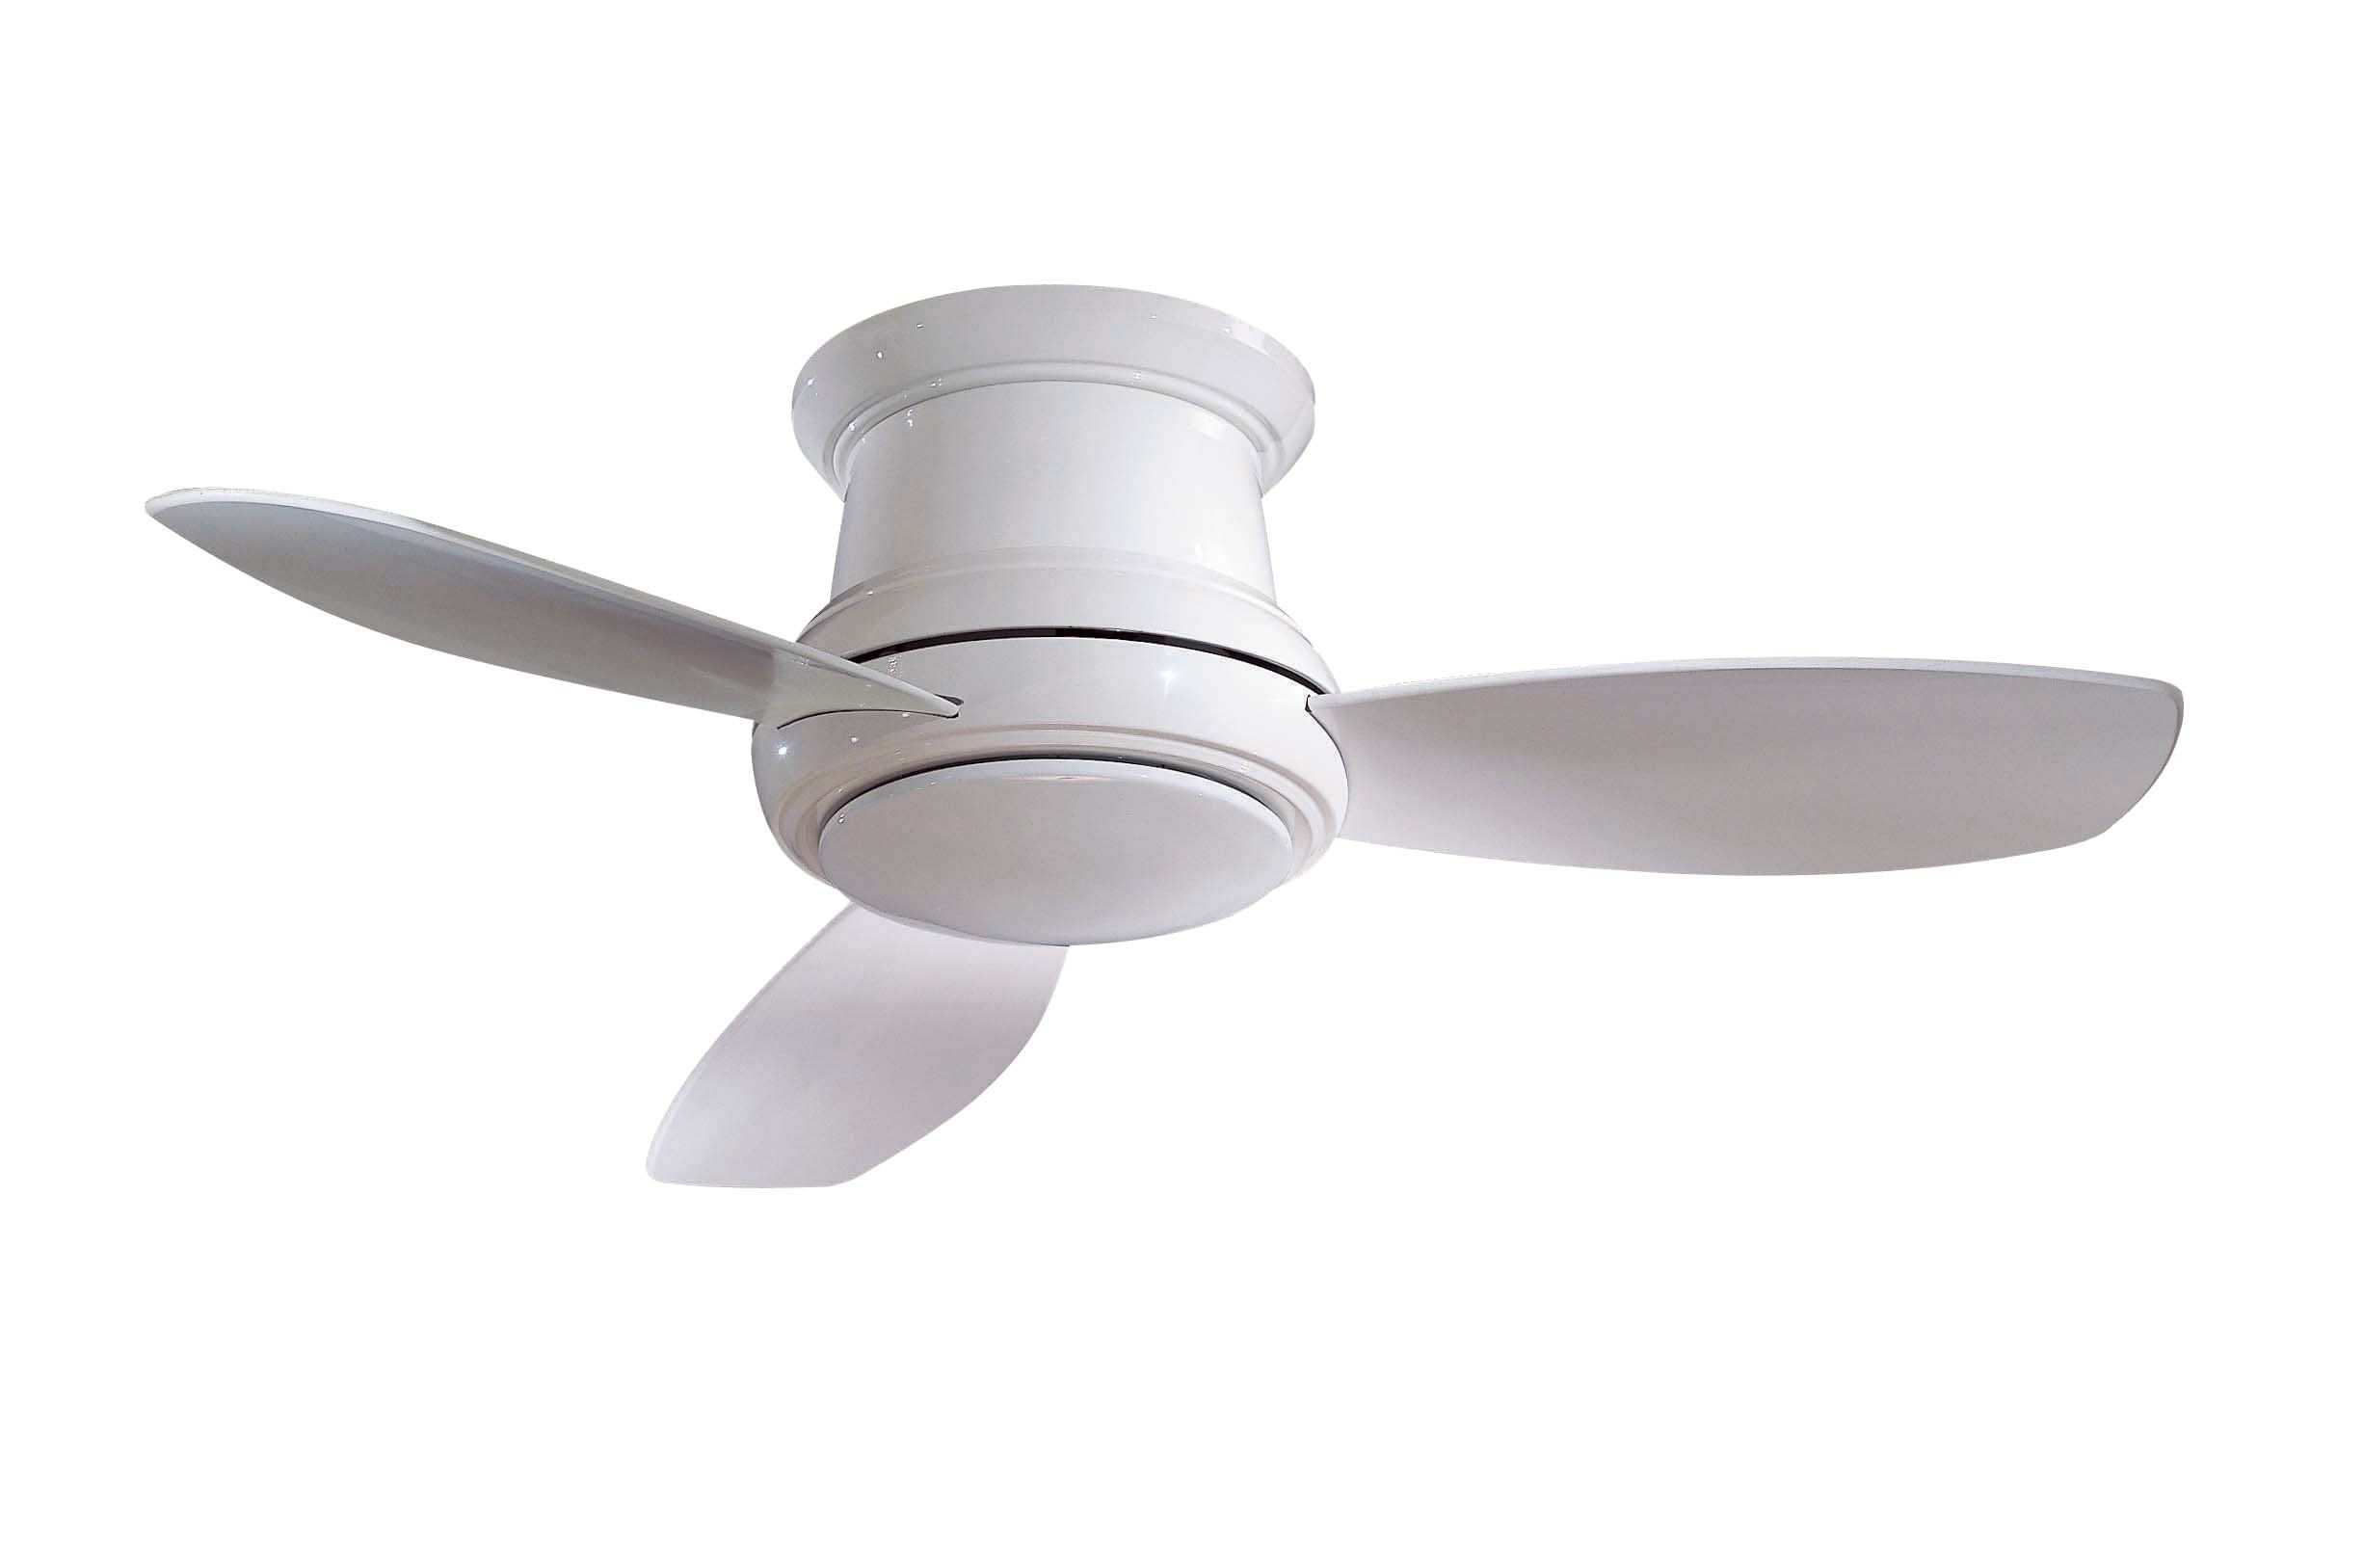 Minka Aire F519 PN 52 inch Concept II Flush Mount Ceiling Fan